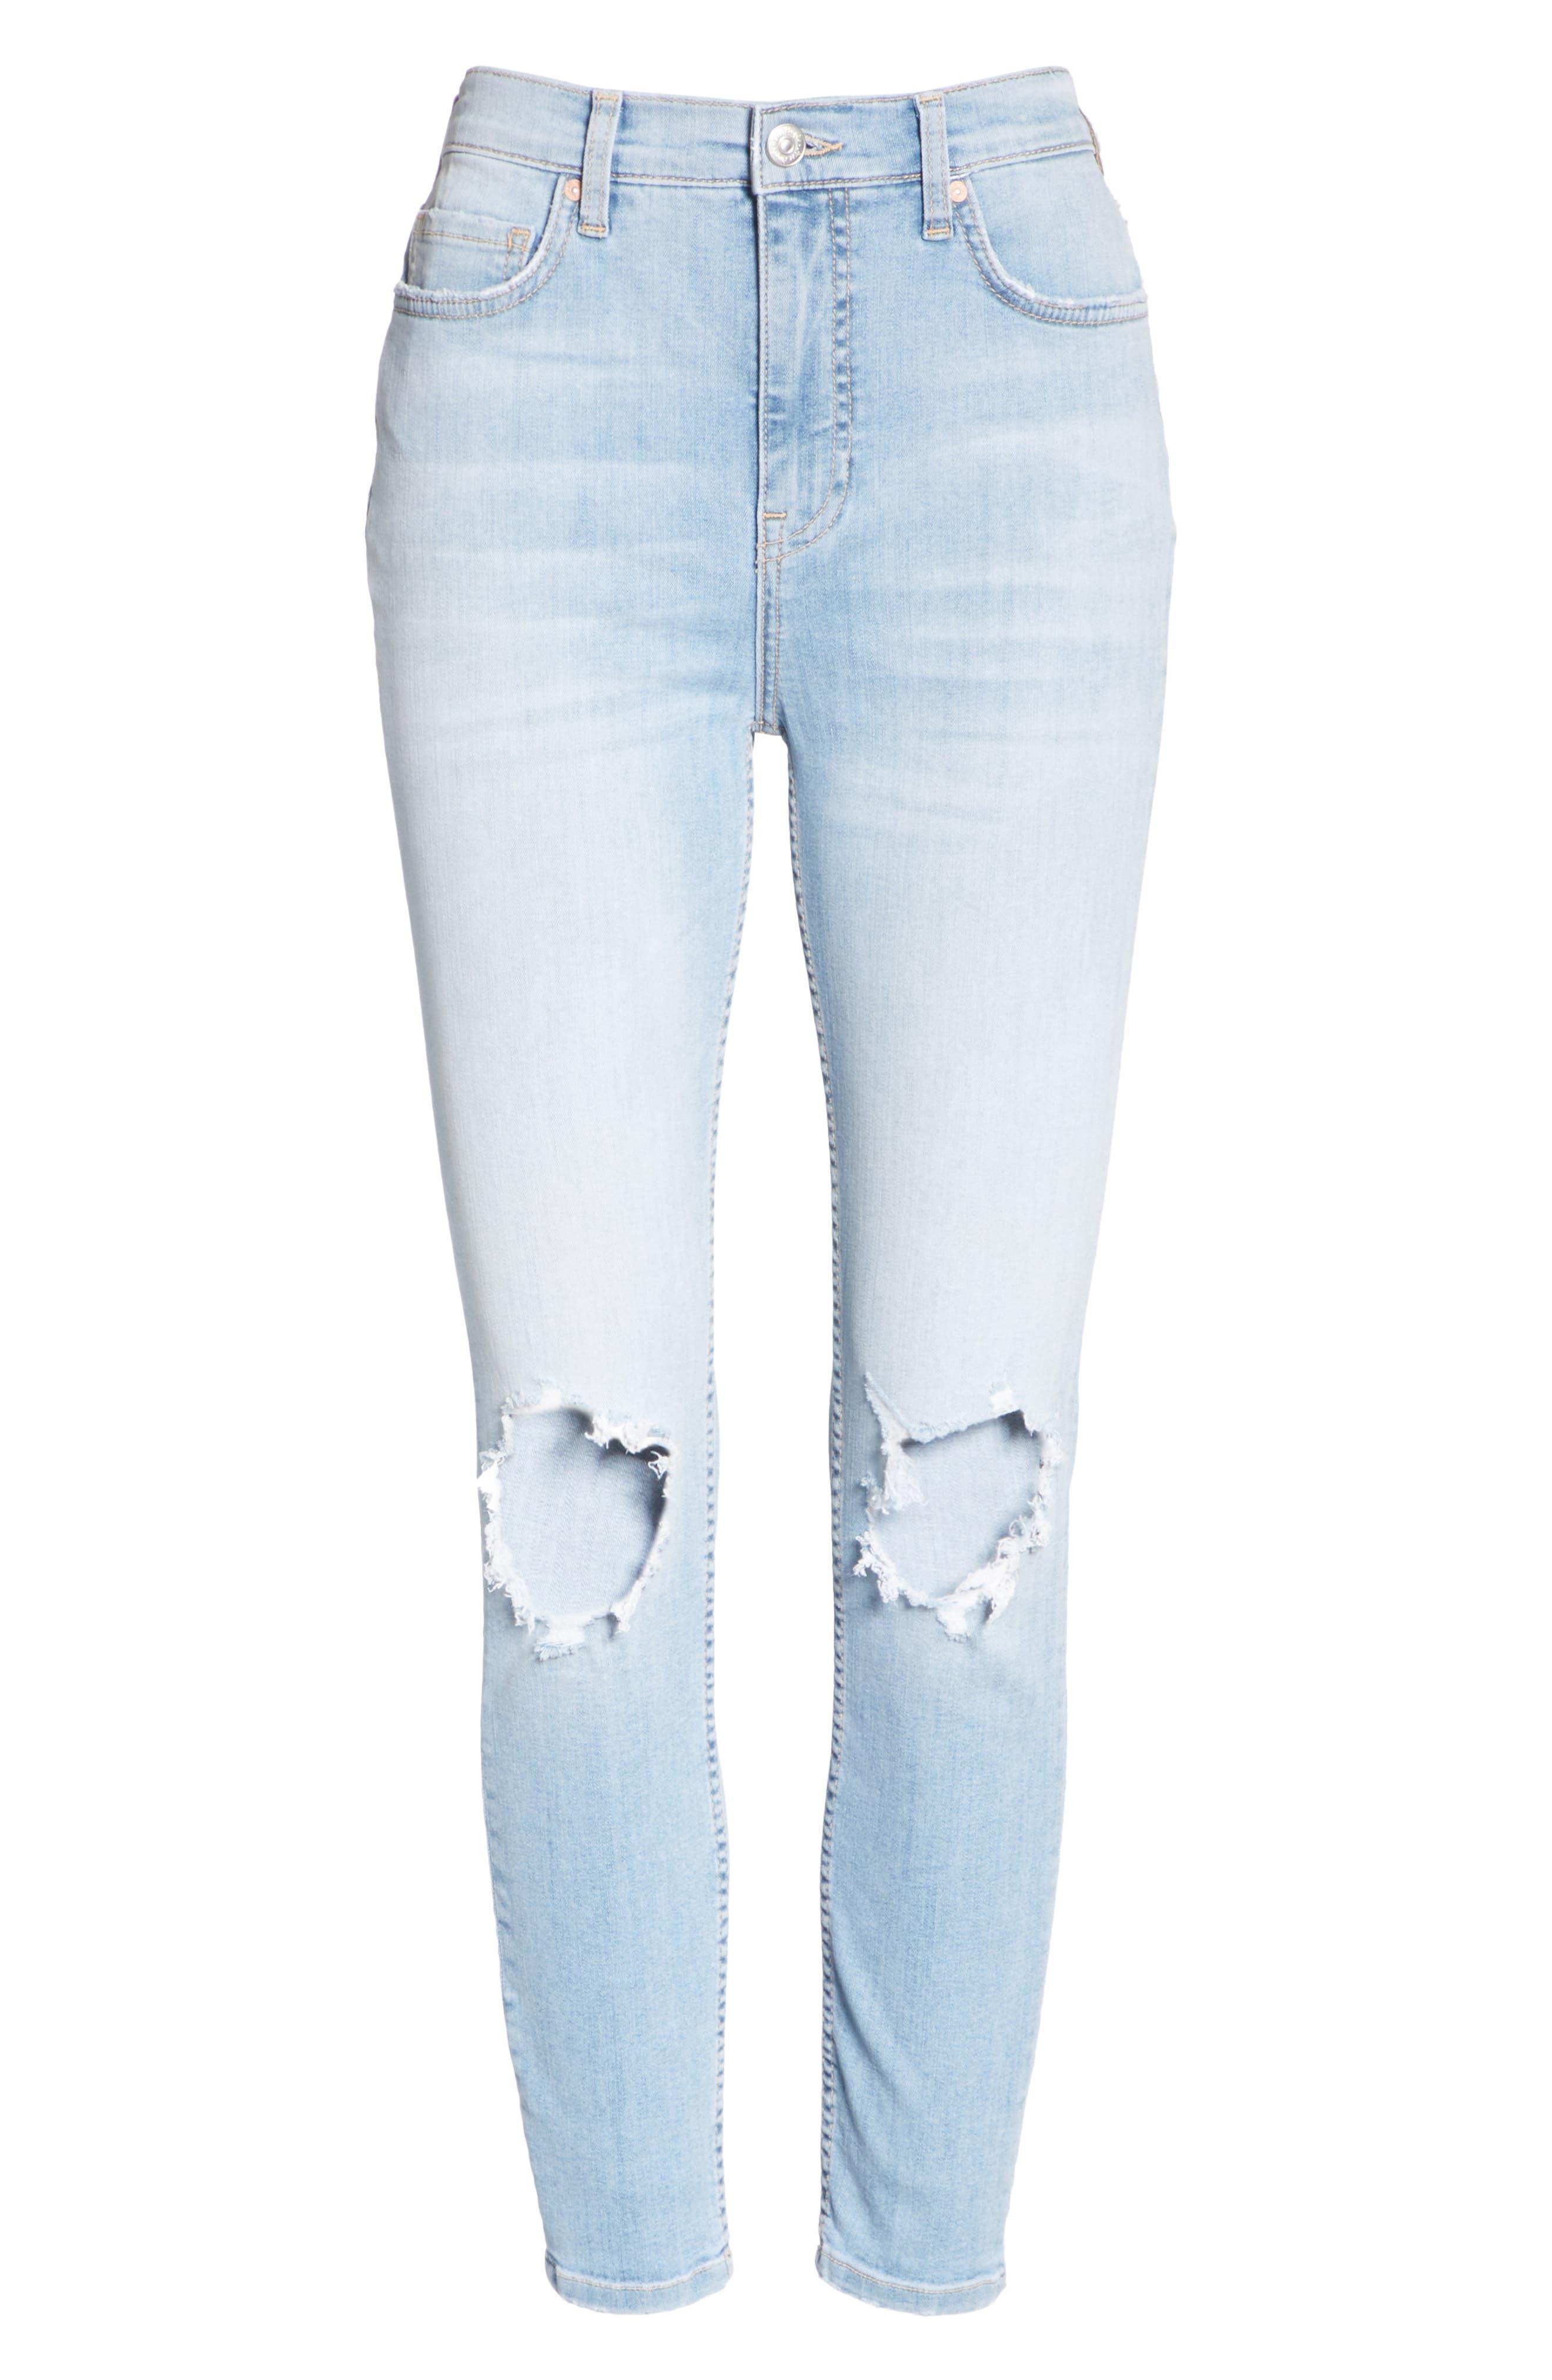 High Waist Ankle Skinny Jeans,                             Alternate thumbnail 7, color,                             Sky